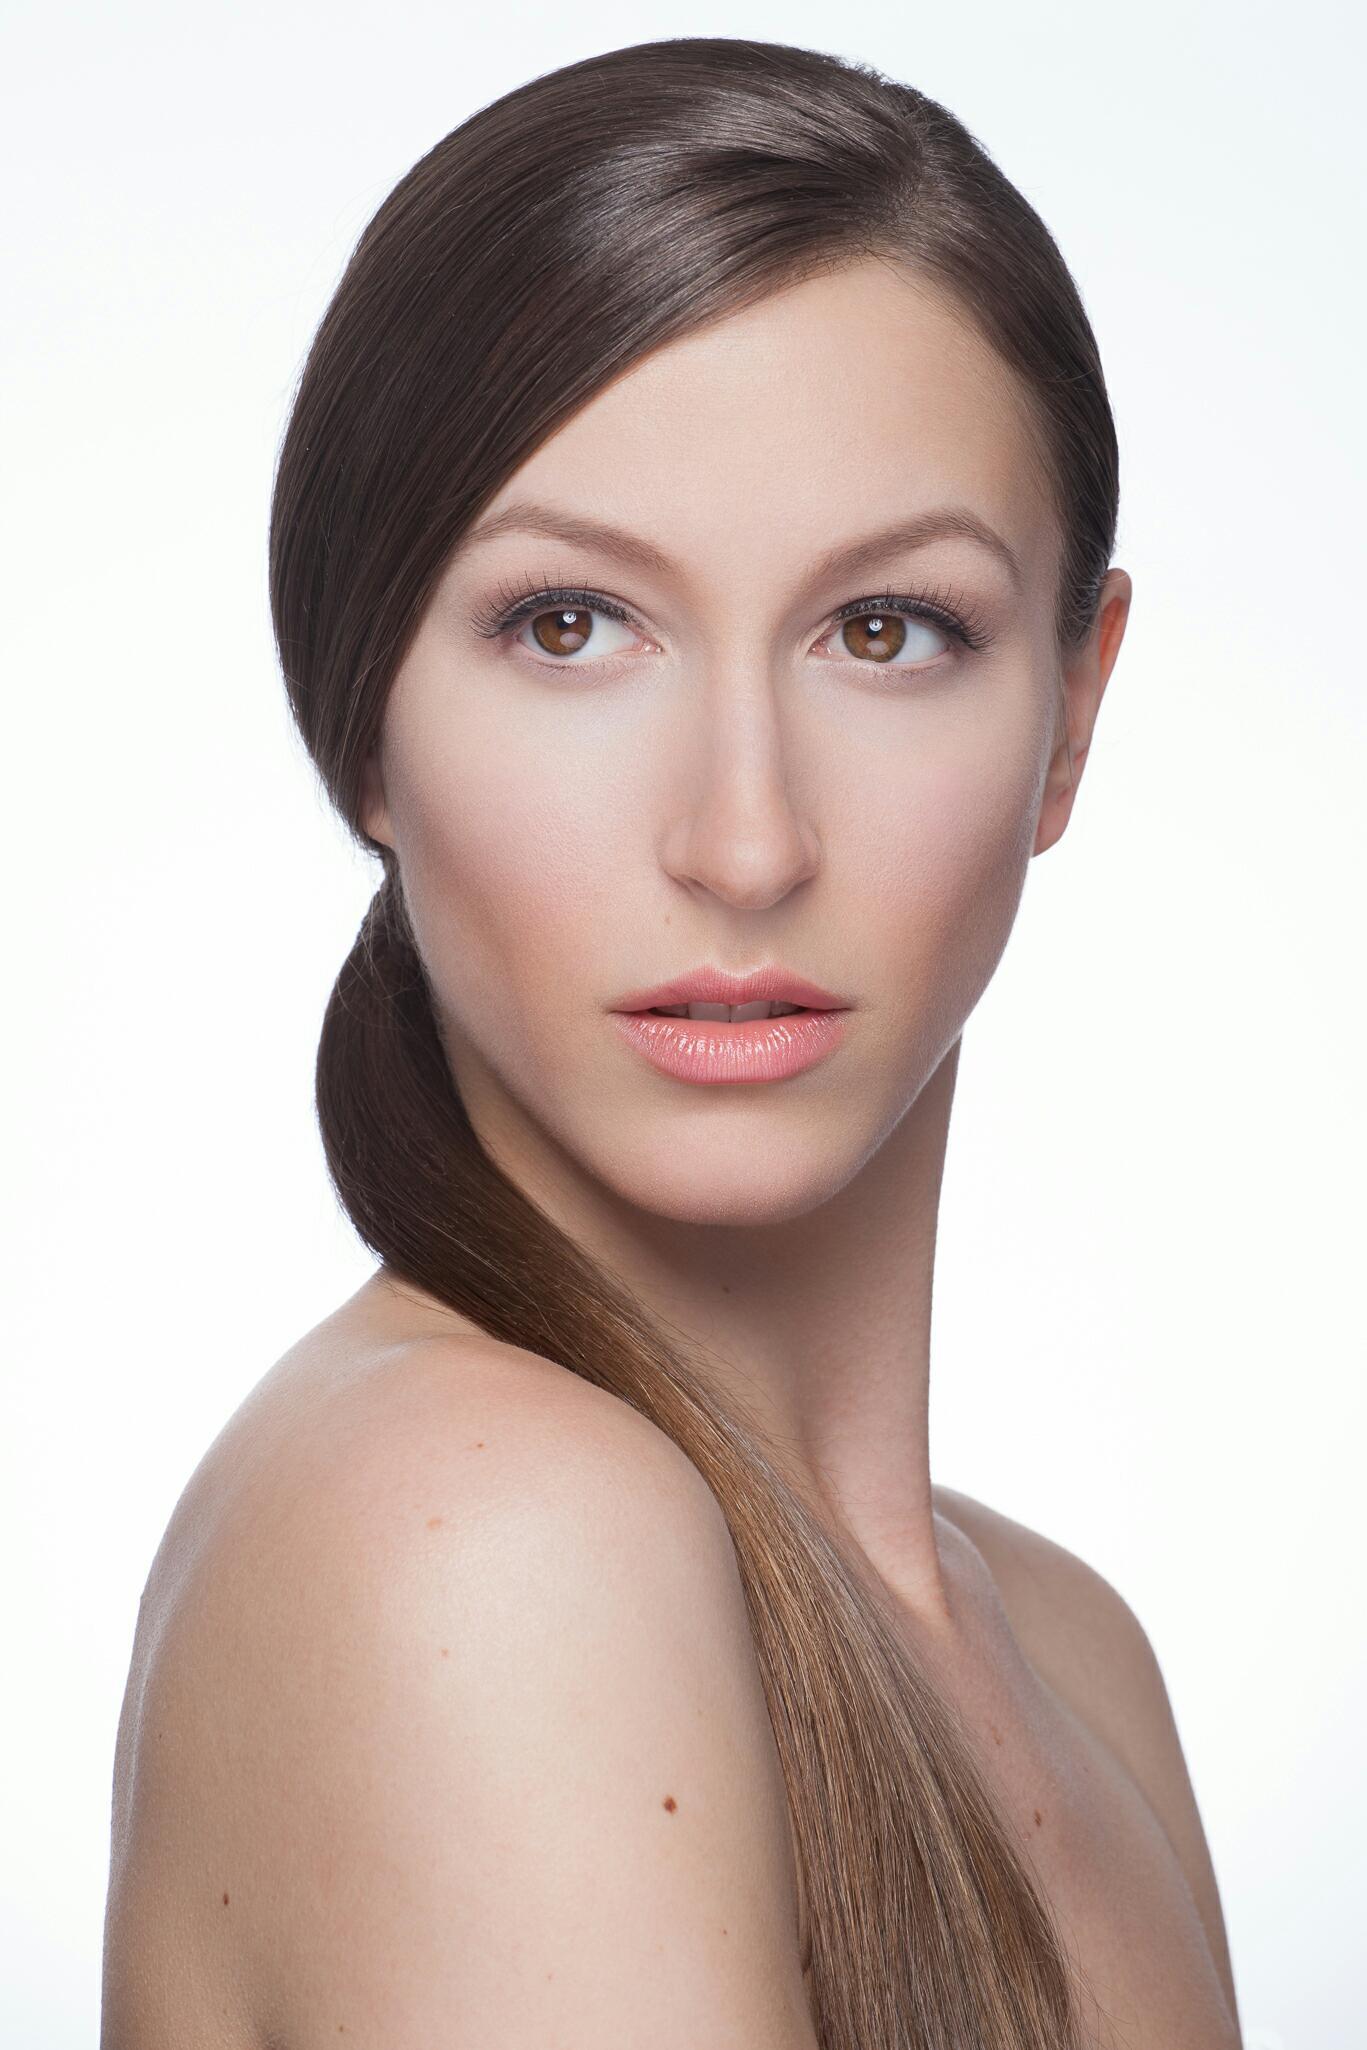 Actress/Model Danielle Alura